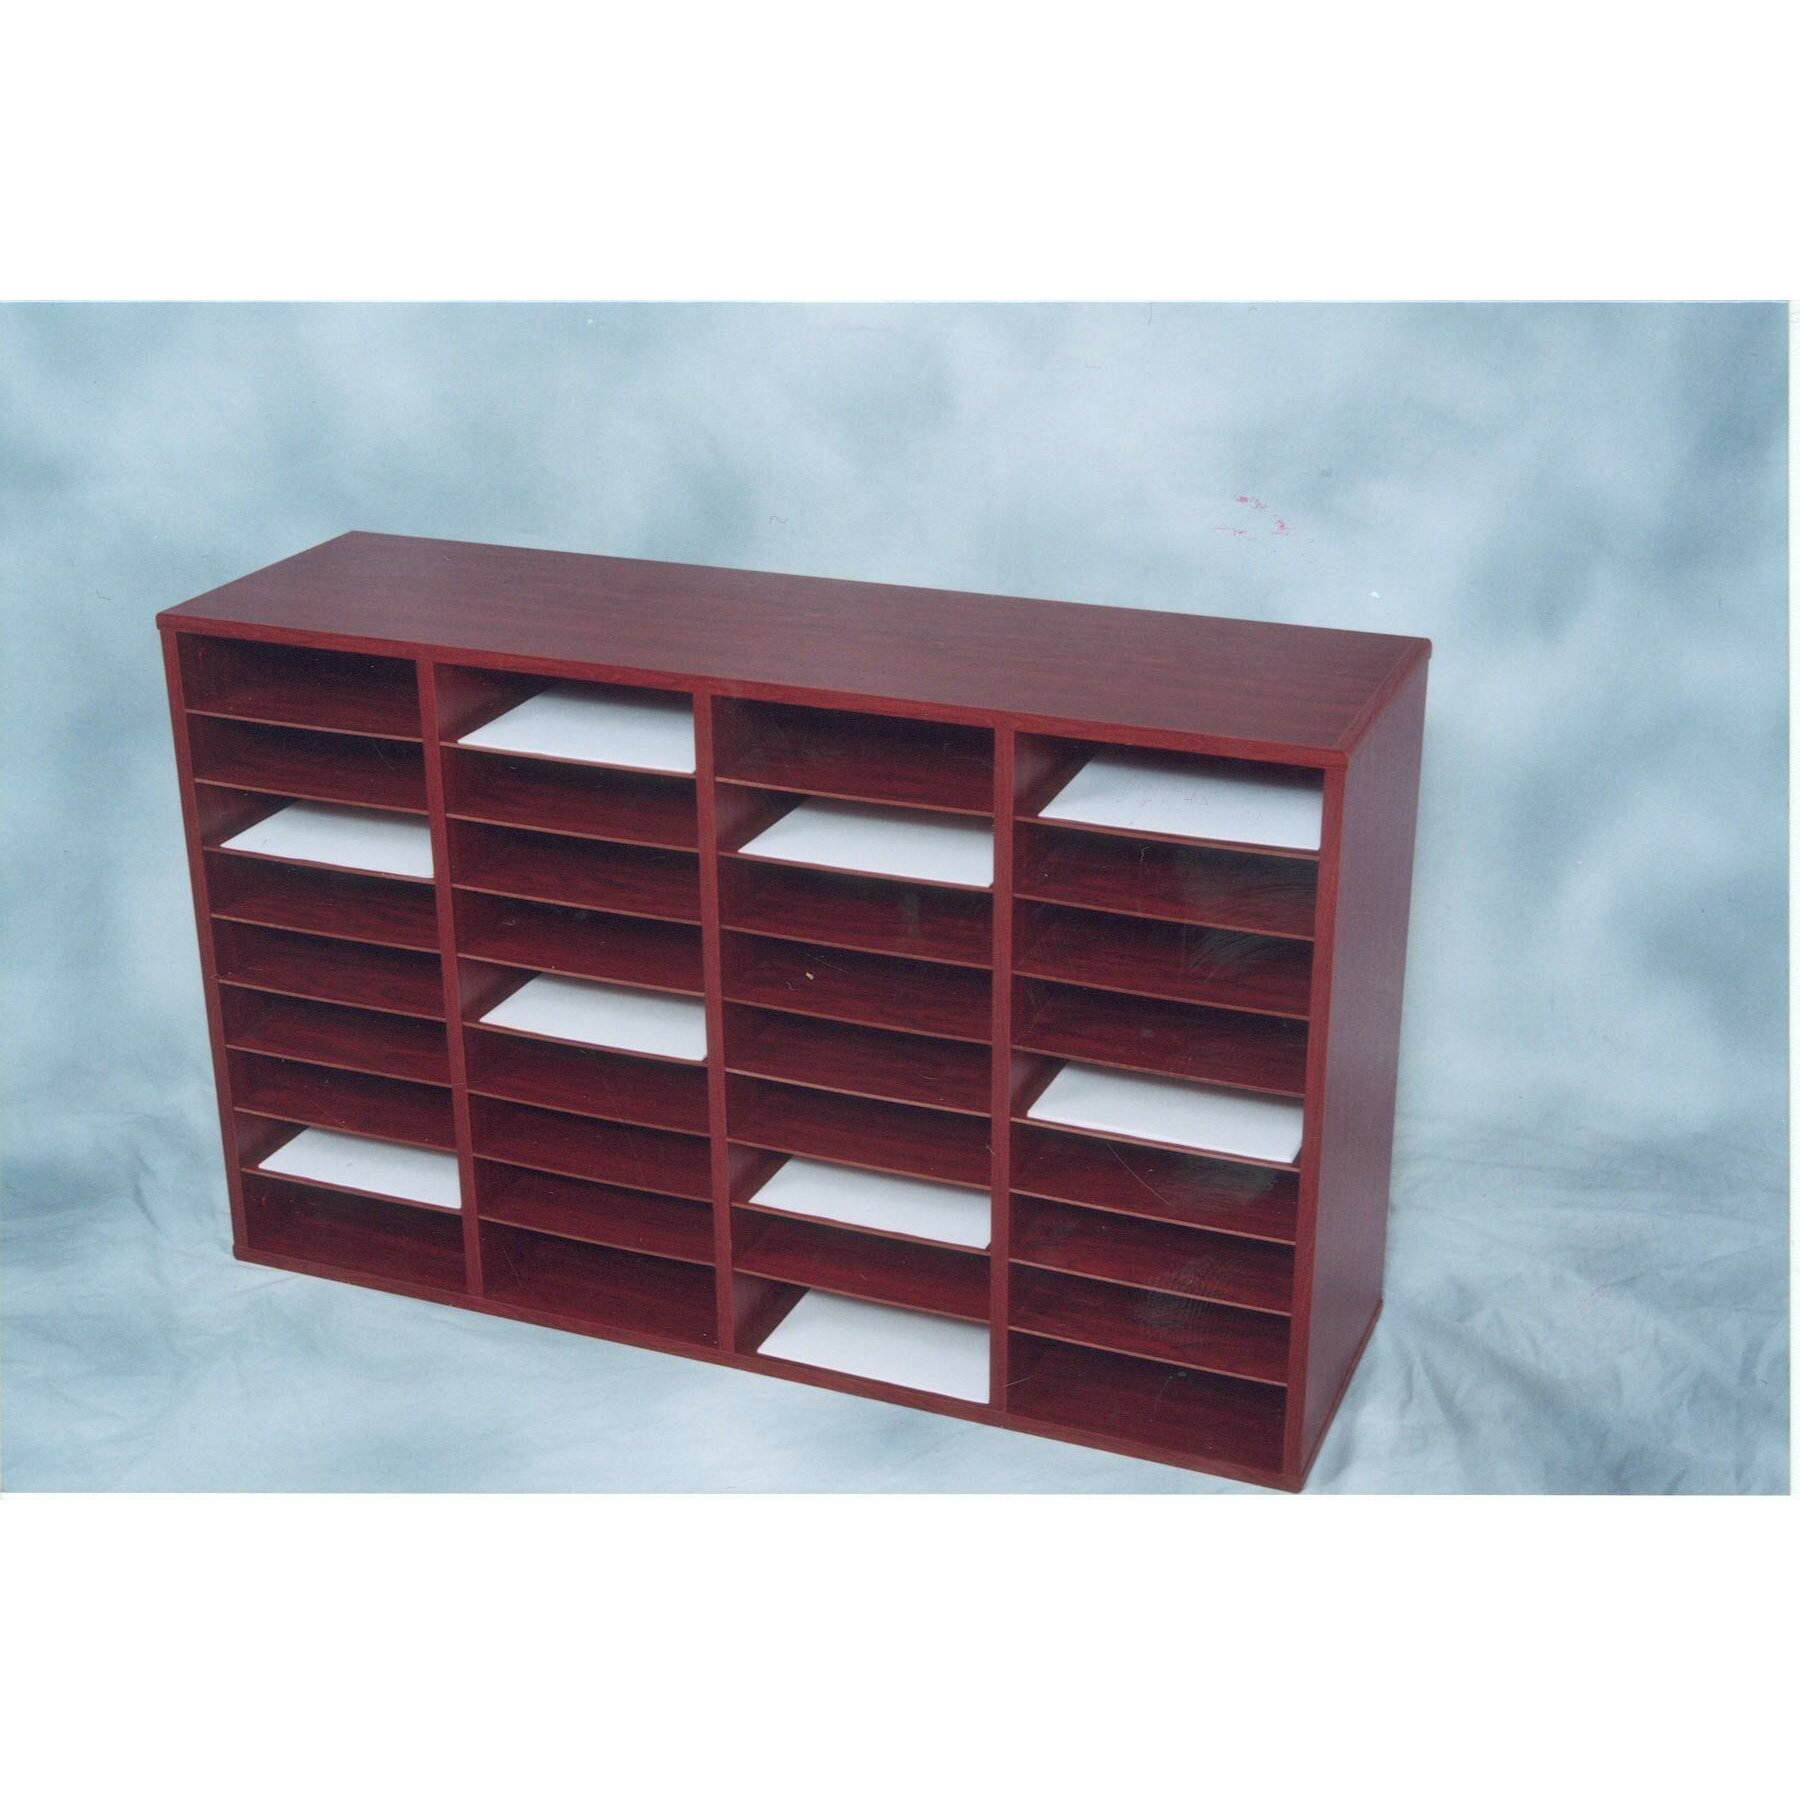 Norsons industries llc 36 compartment laminate literature for Abanos furniture industries decoration llc